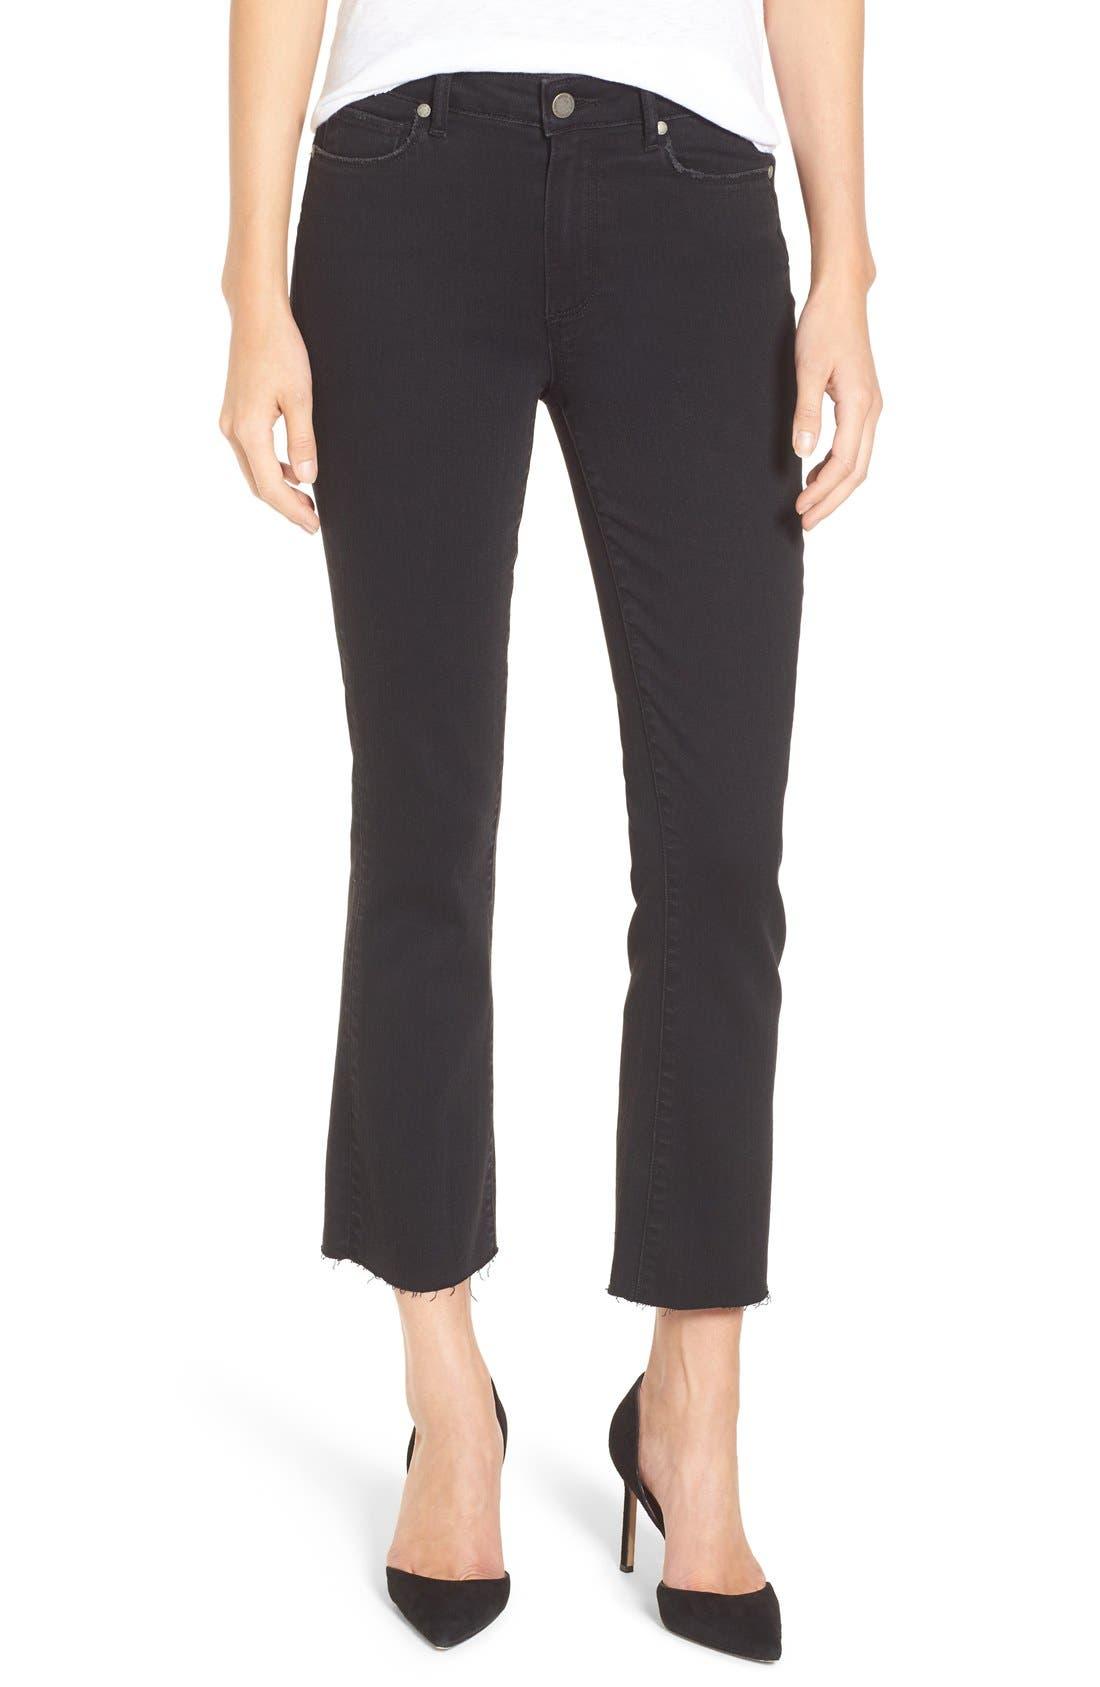 Colette High Waist Raw Hem Crop Flare Jeans,                         Main,                         color, 001